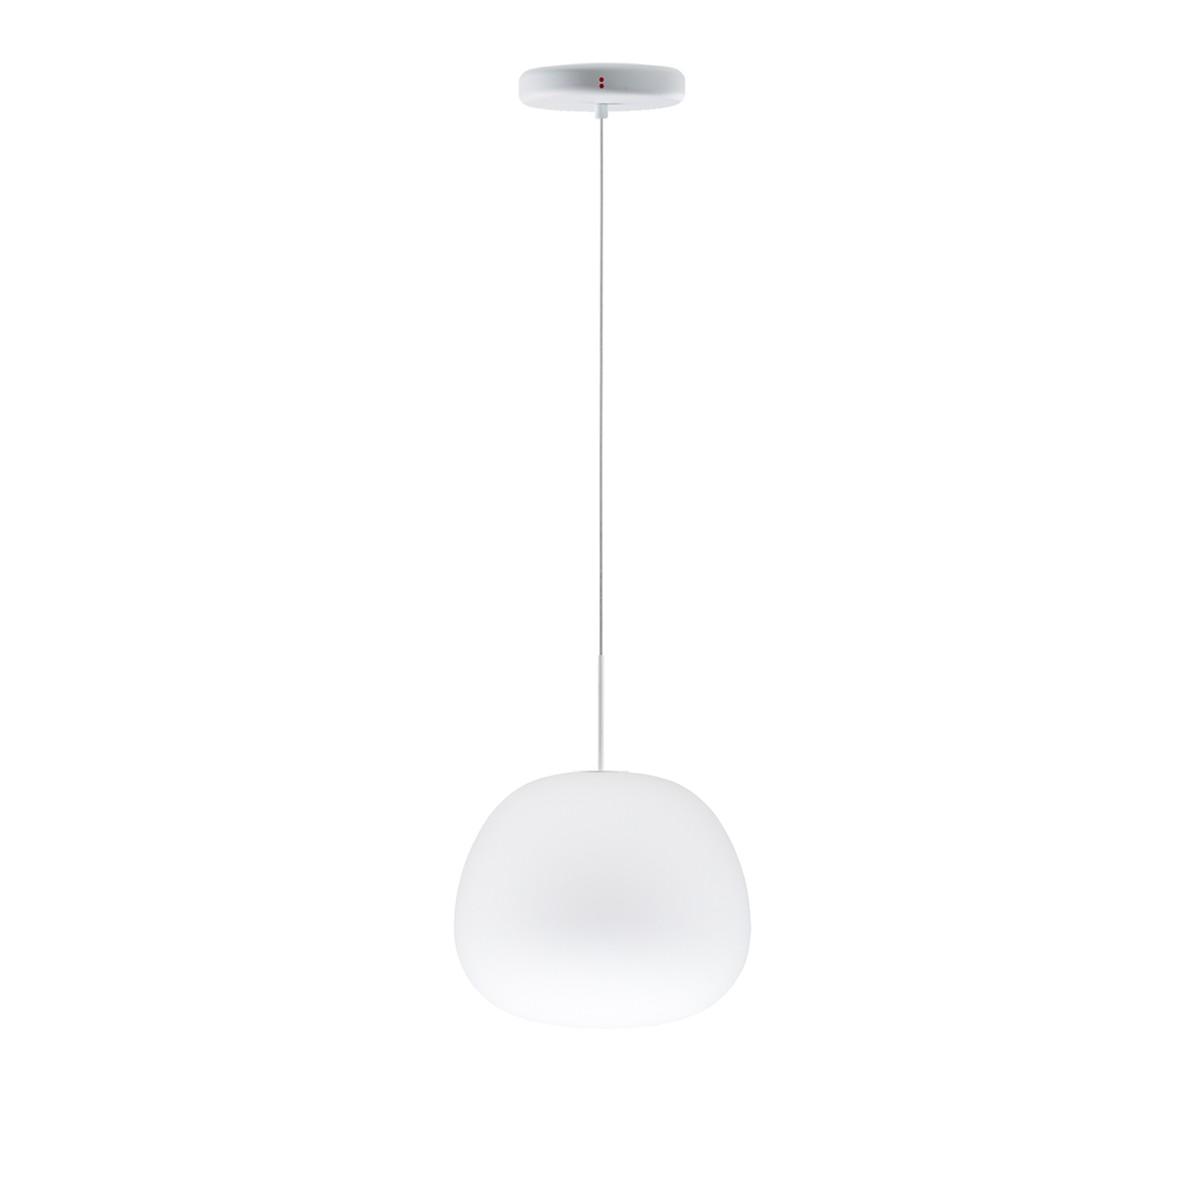 Fabbian Lumi Mochi Pendelleuchte, Ø: 20 cm, weiß